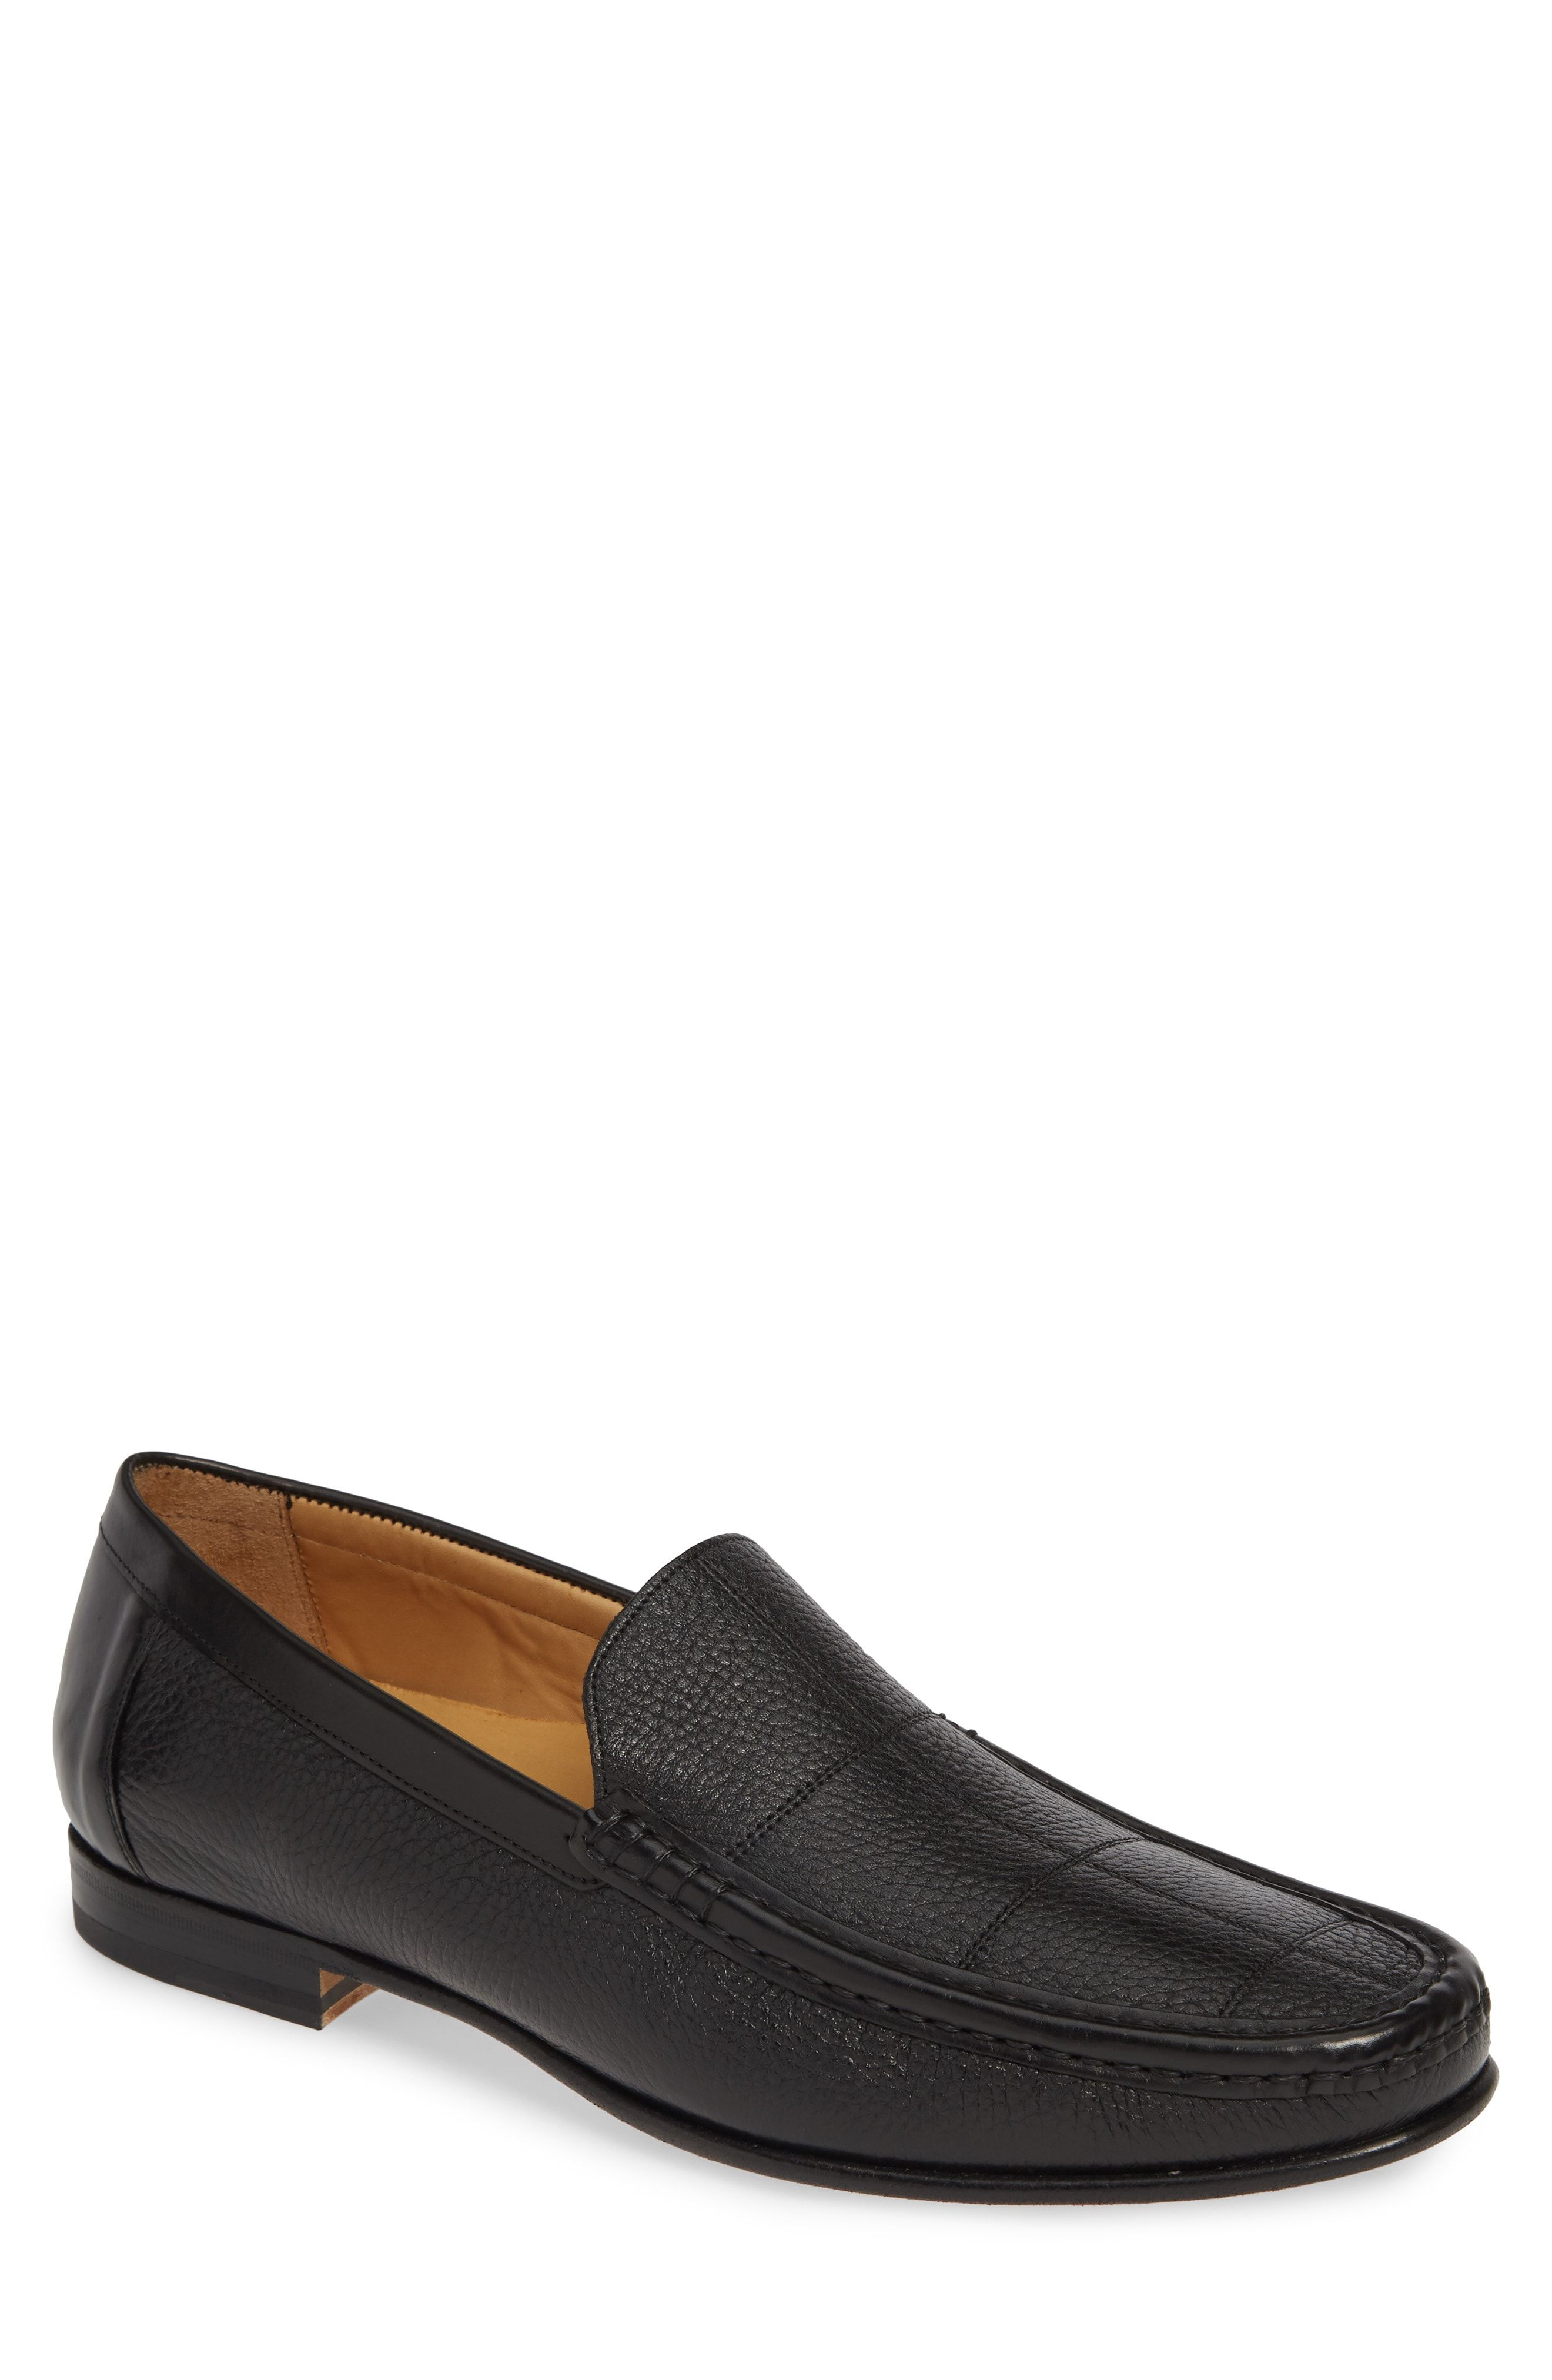 0c40cba4d6b MEZLAN IMANOL VENETIAN LOAFER.  mezlan  shoes